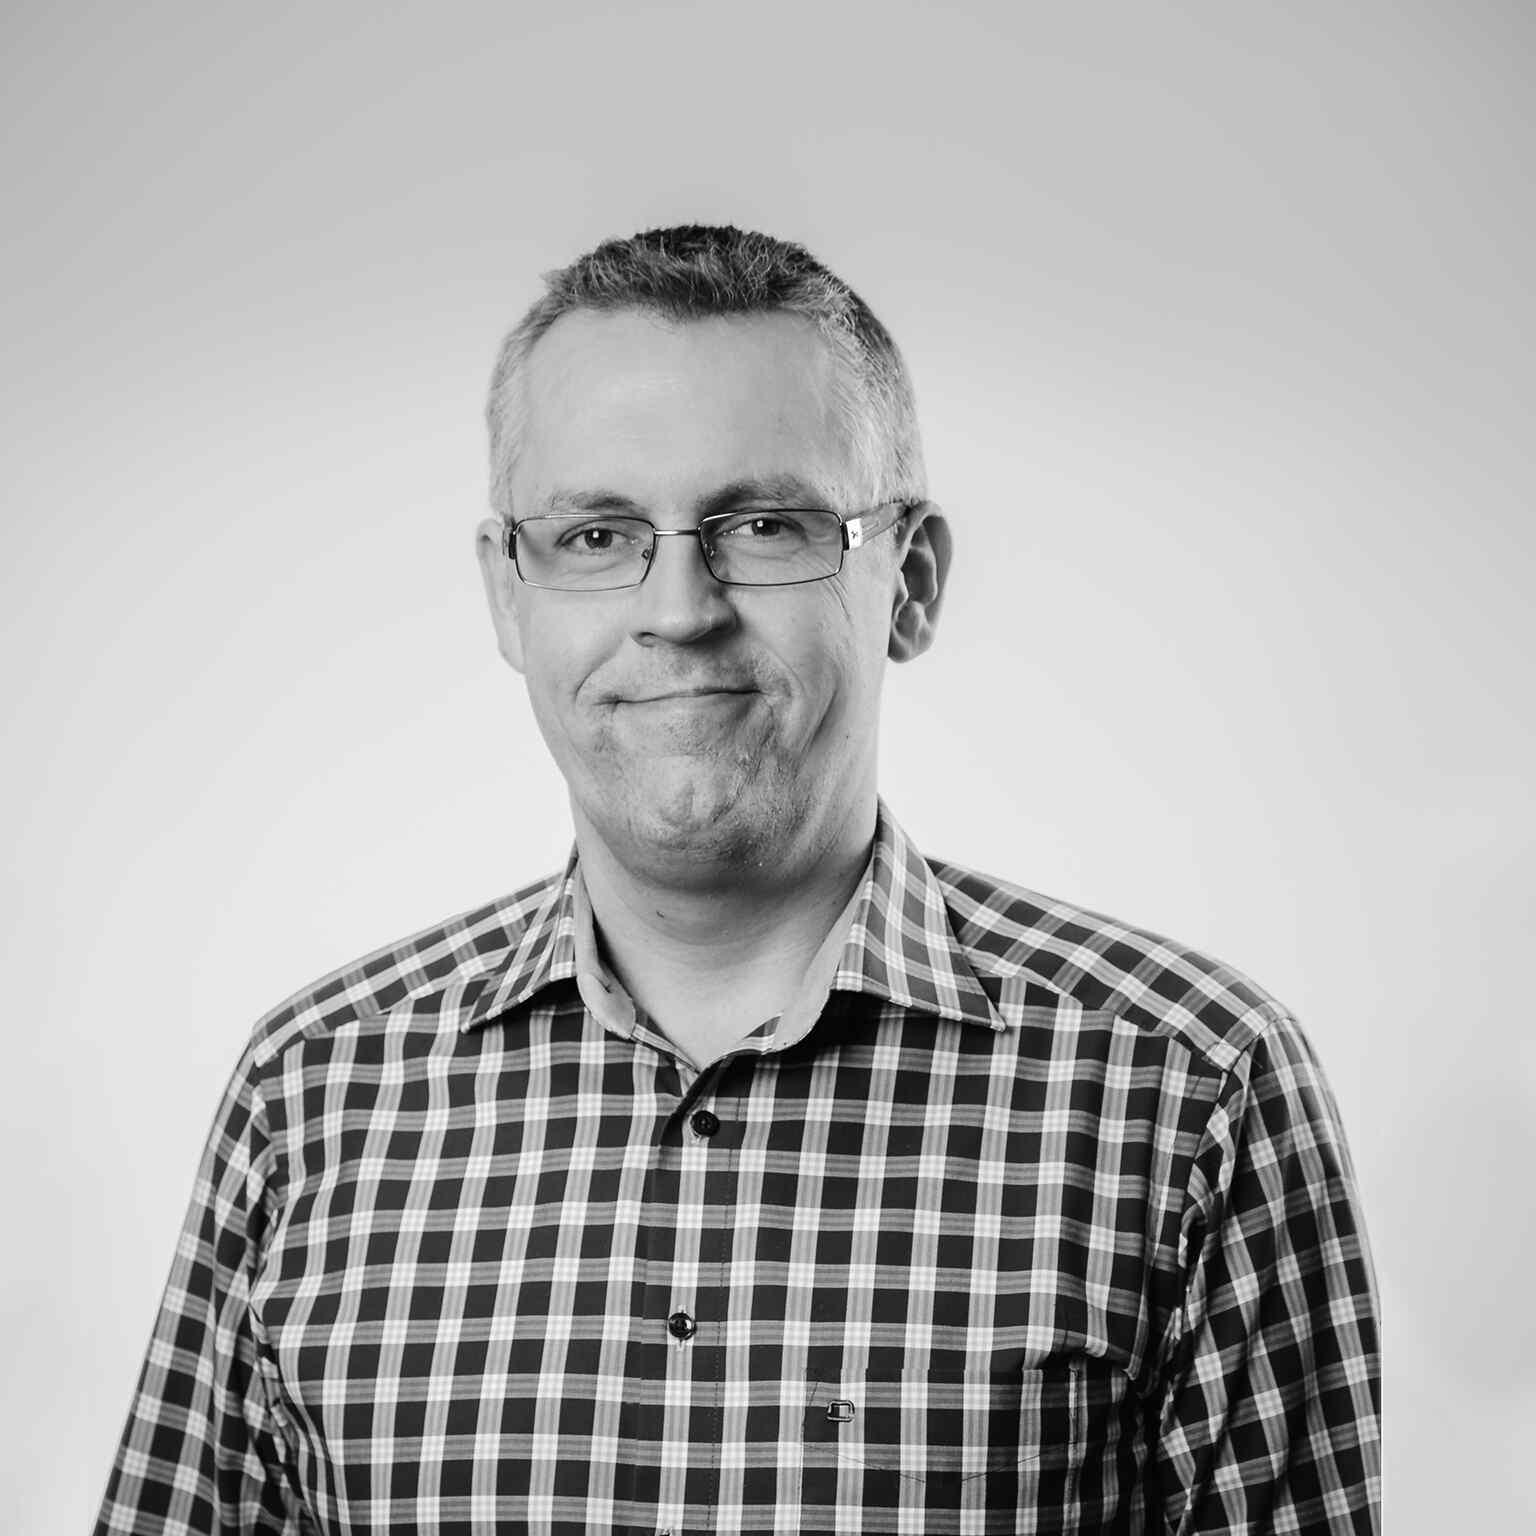 Hr. Prok. DI (FH) Martin Sinawehl, MSc.